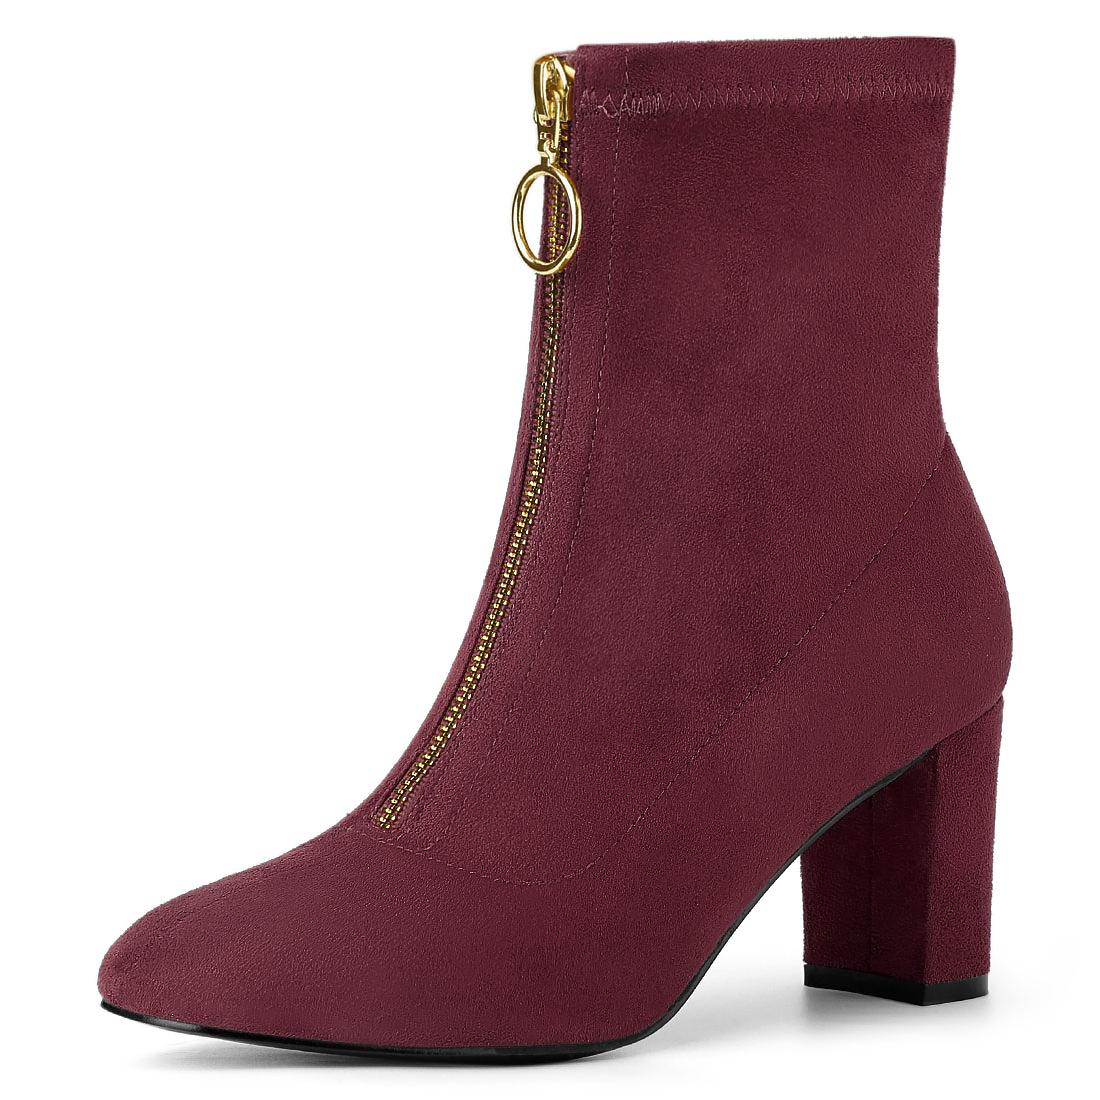 Allegra K Women's Front Zipper Chunky Heel Ankle Boots Burgundy US 5.5